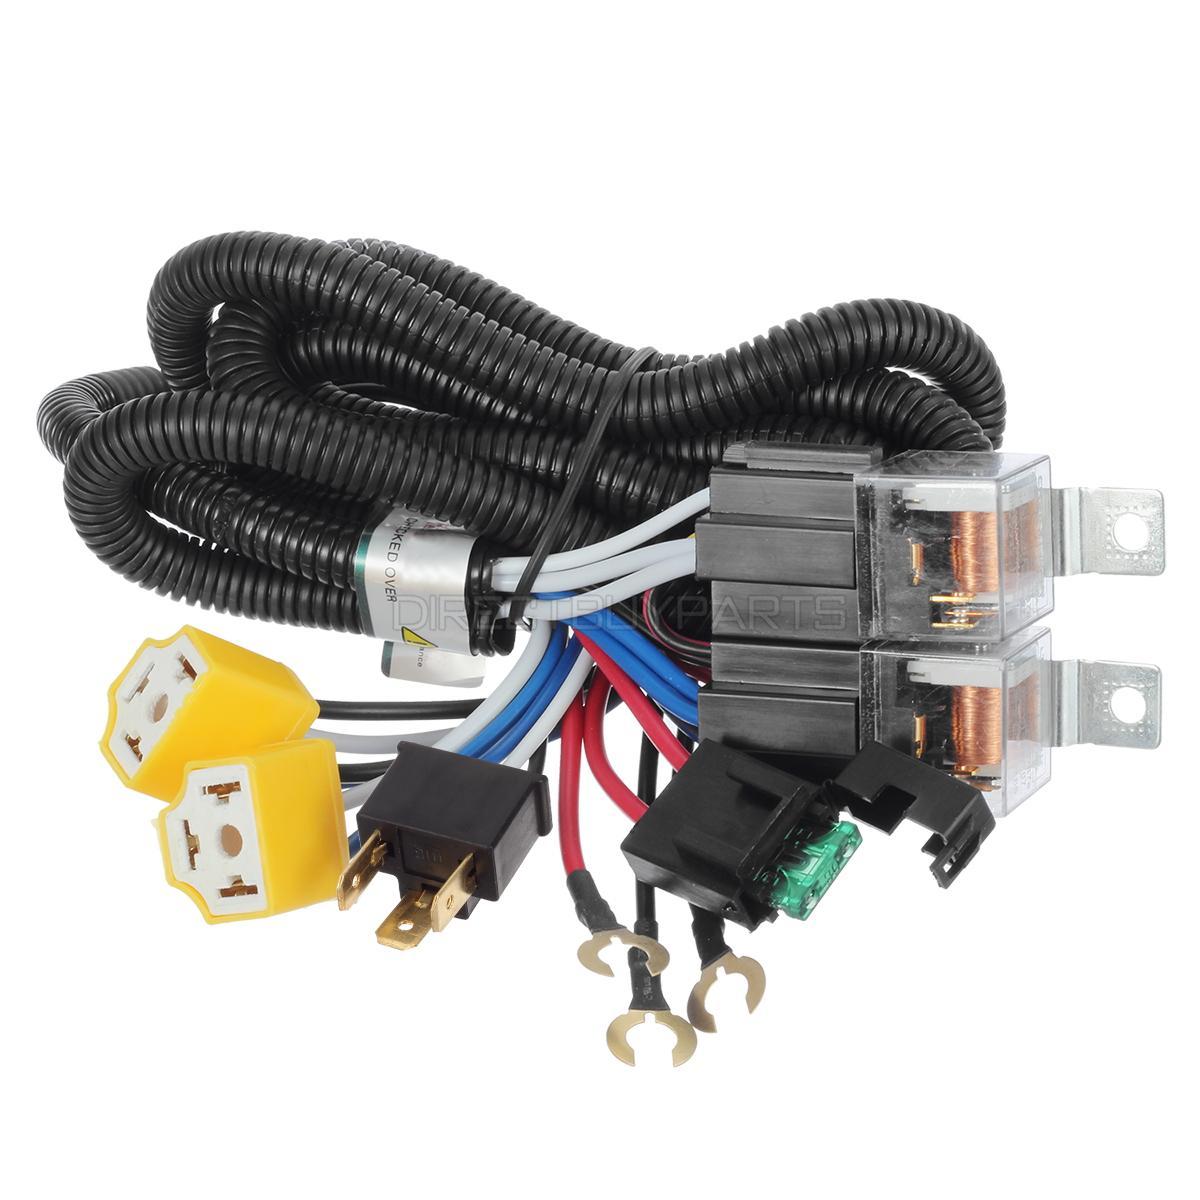 for headlight h4  9003 ceramic controller harness relay roots headlight wiring kit headlight wiring kit clk55 amg 2002